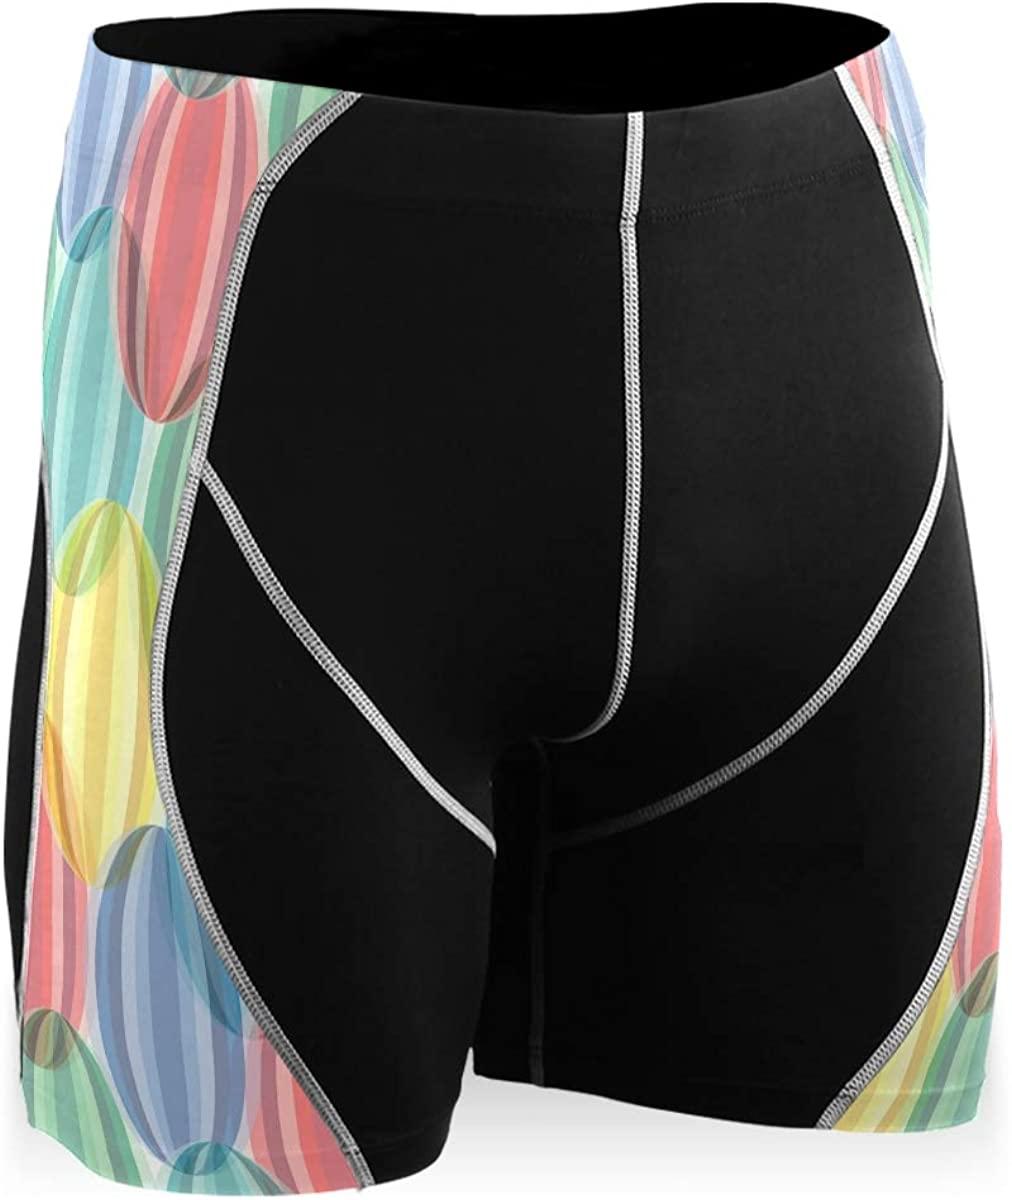 Ladninag Retro Cartoon Cute Chic Watermelon Men's Compression Shorts Running Yoga Cool Dry Baselayer Youth